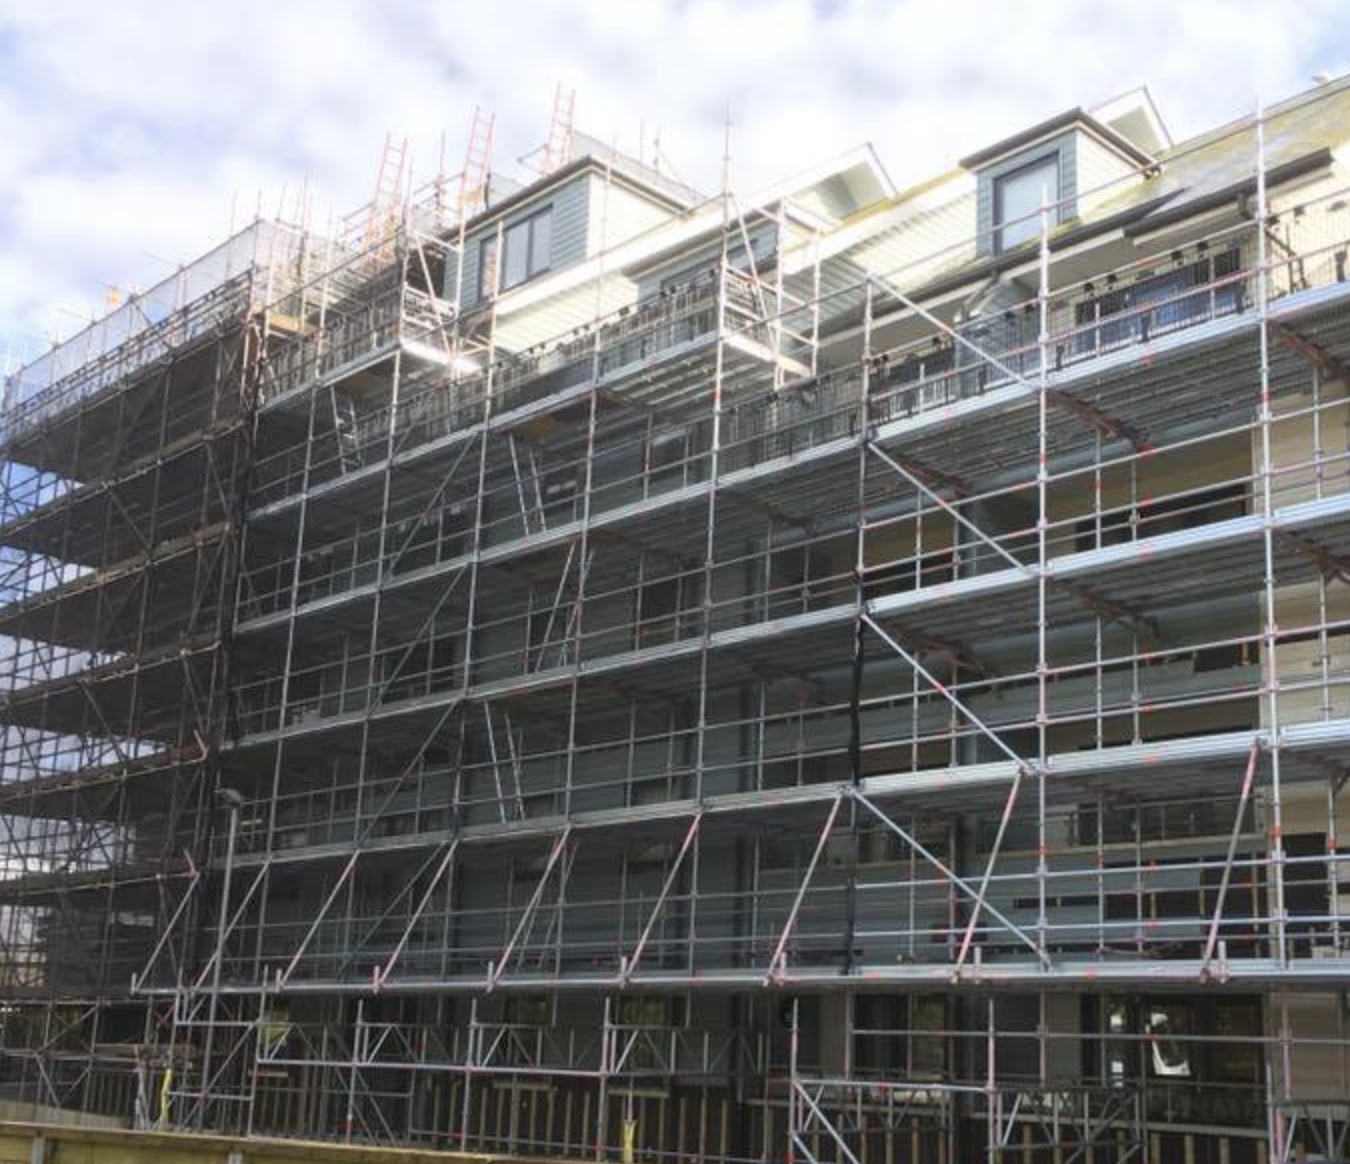 Commercial Scaffolding Dorset - ADK Scaffolding Ltd